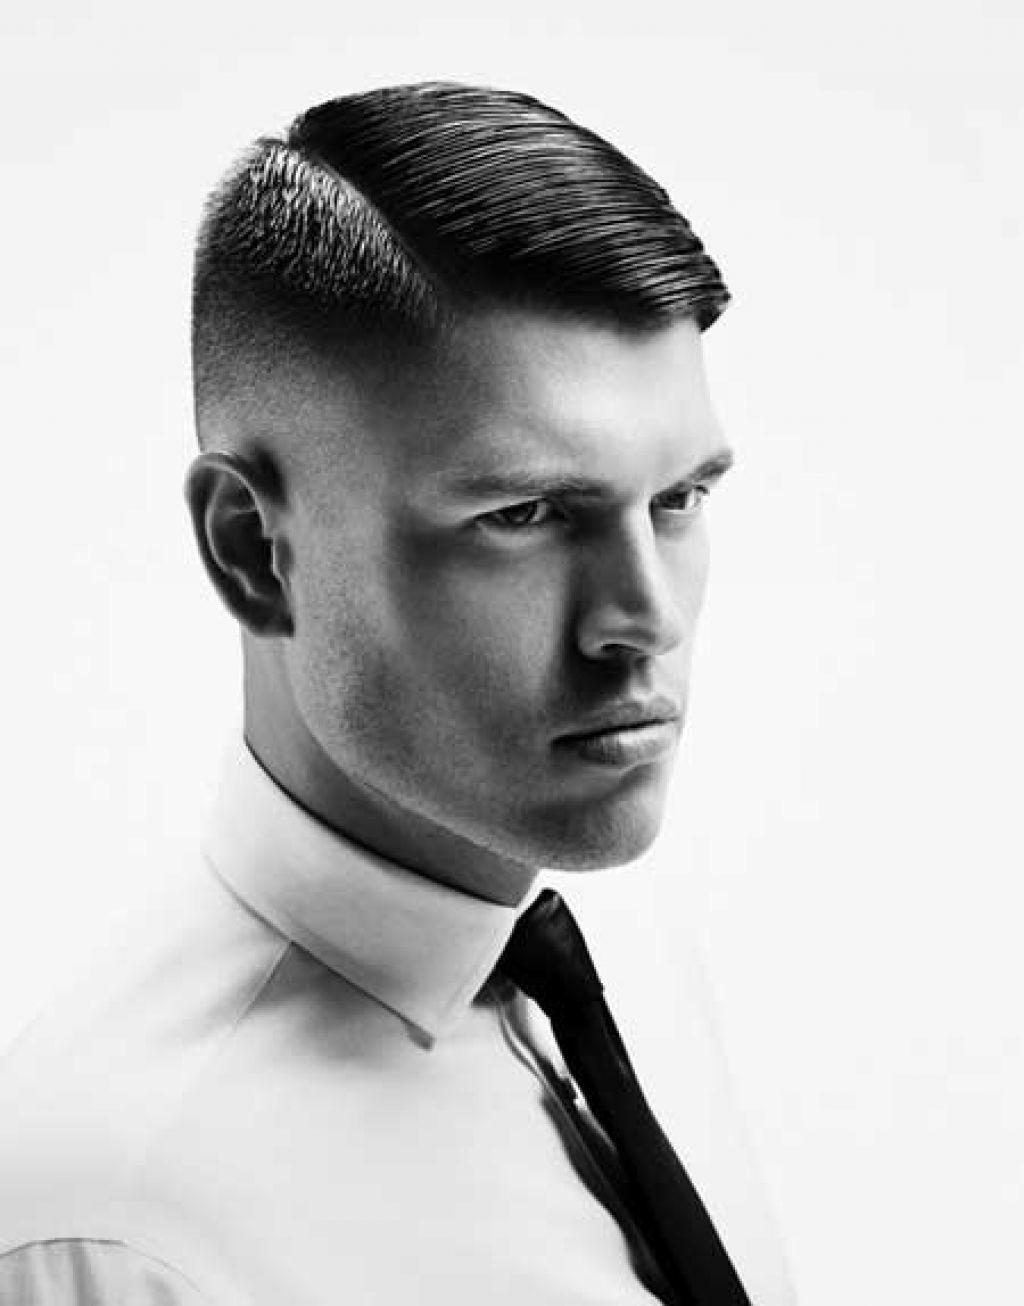 Männer Kurzhaarfrisuren 2015 Undercut Ist Ein Trend Männerfrisuren